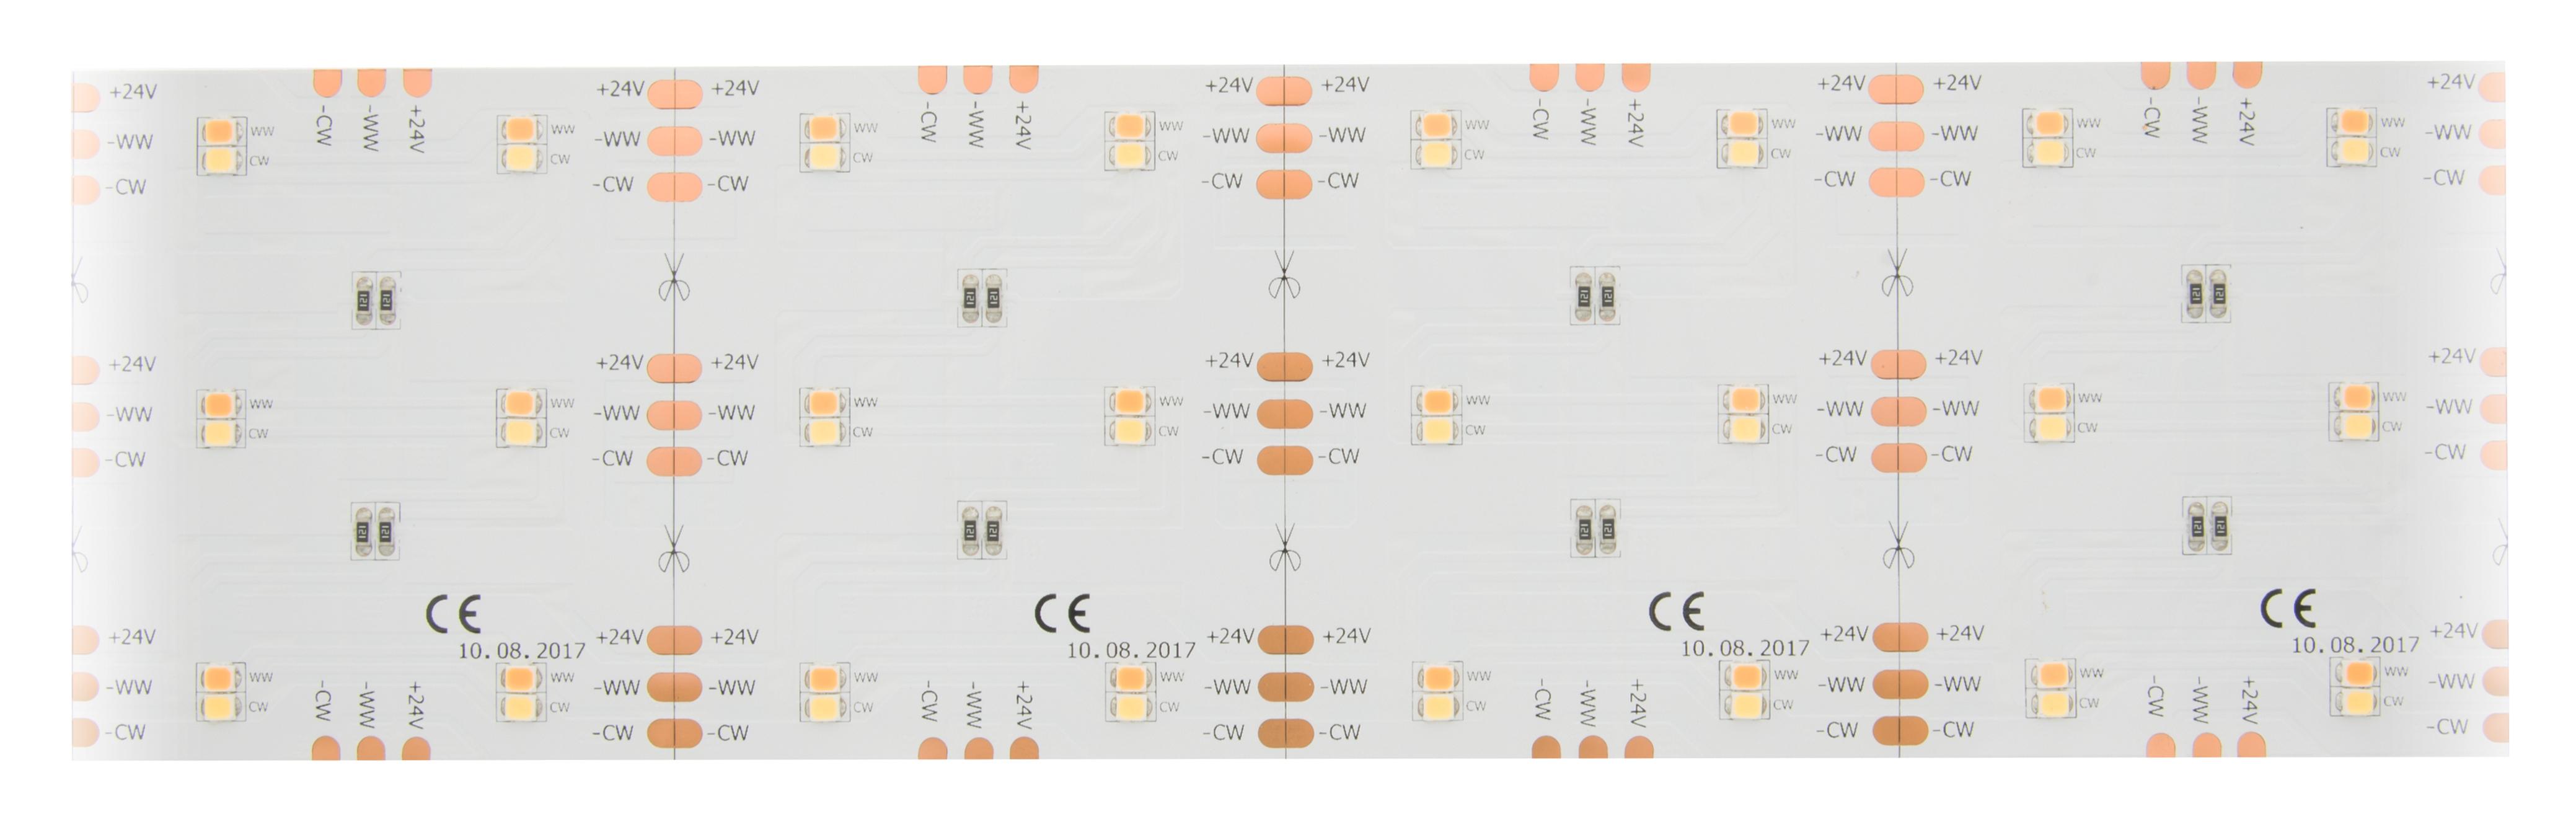 1 Stk LED Flexboard 14 AW (Ambiente White) - IP20, CRI/RA 90+ LIFP102400